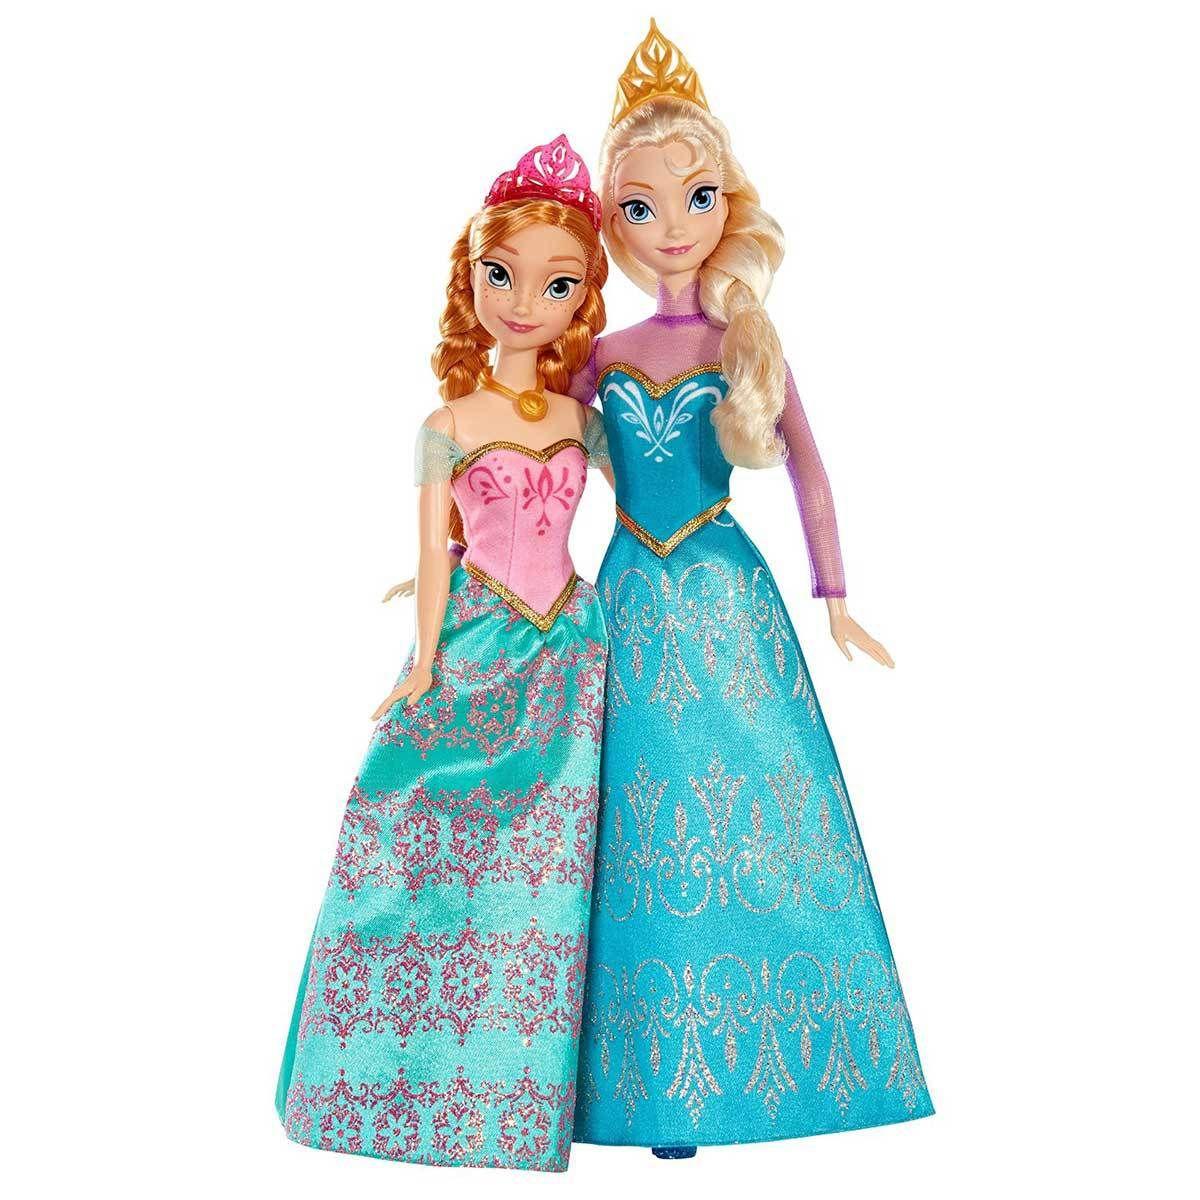 Juguetes de Barbie en español-Barbie Doctora le pone gafas a Elsa ...